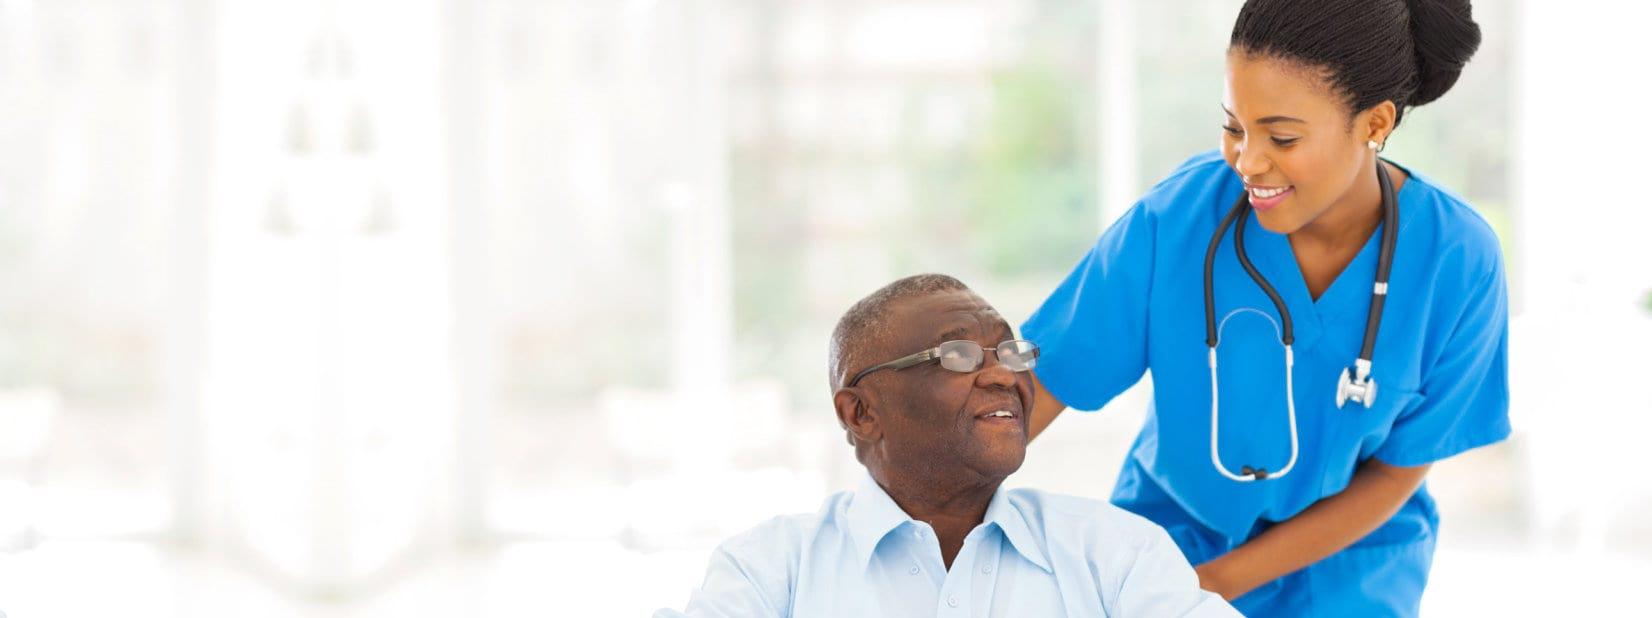 nurse and elder man smiling